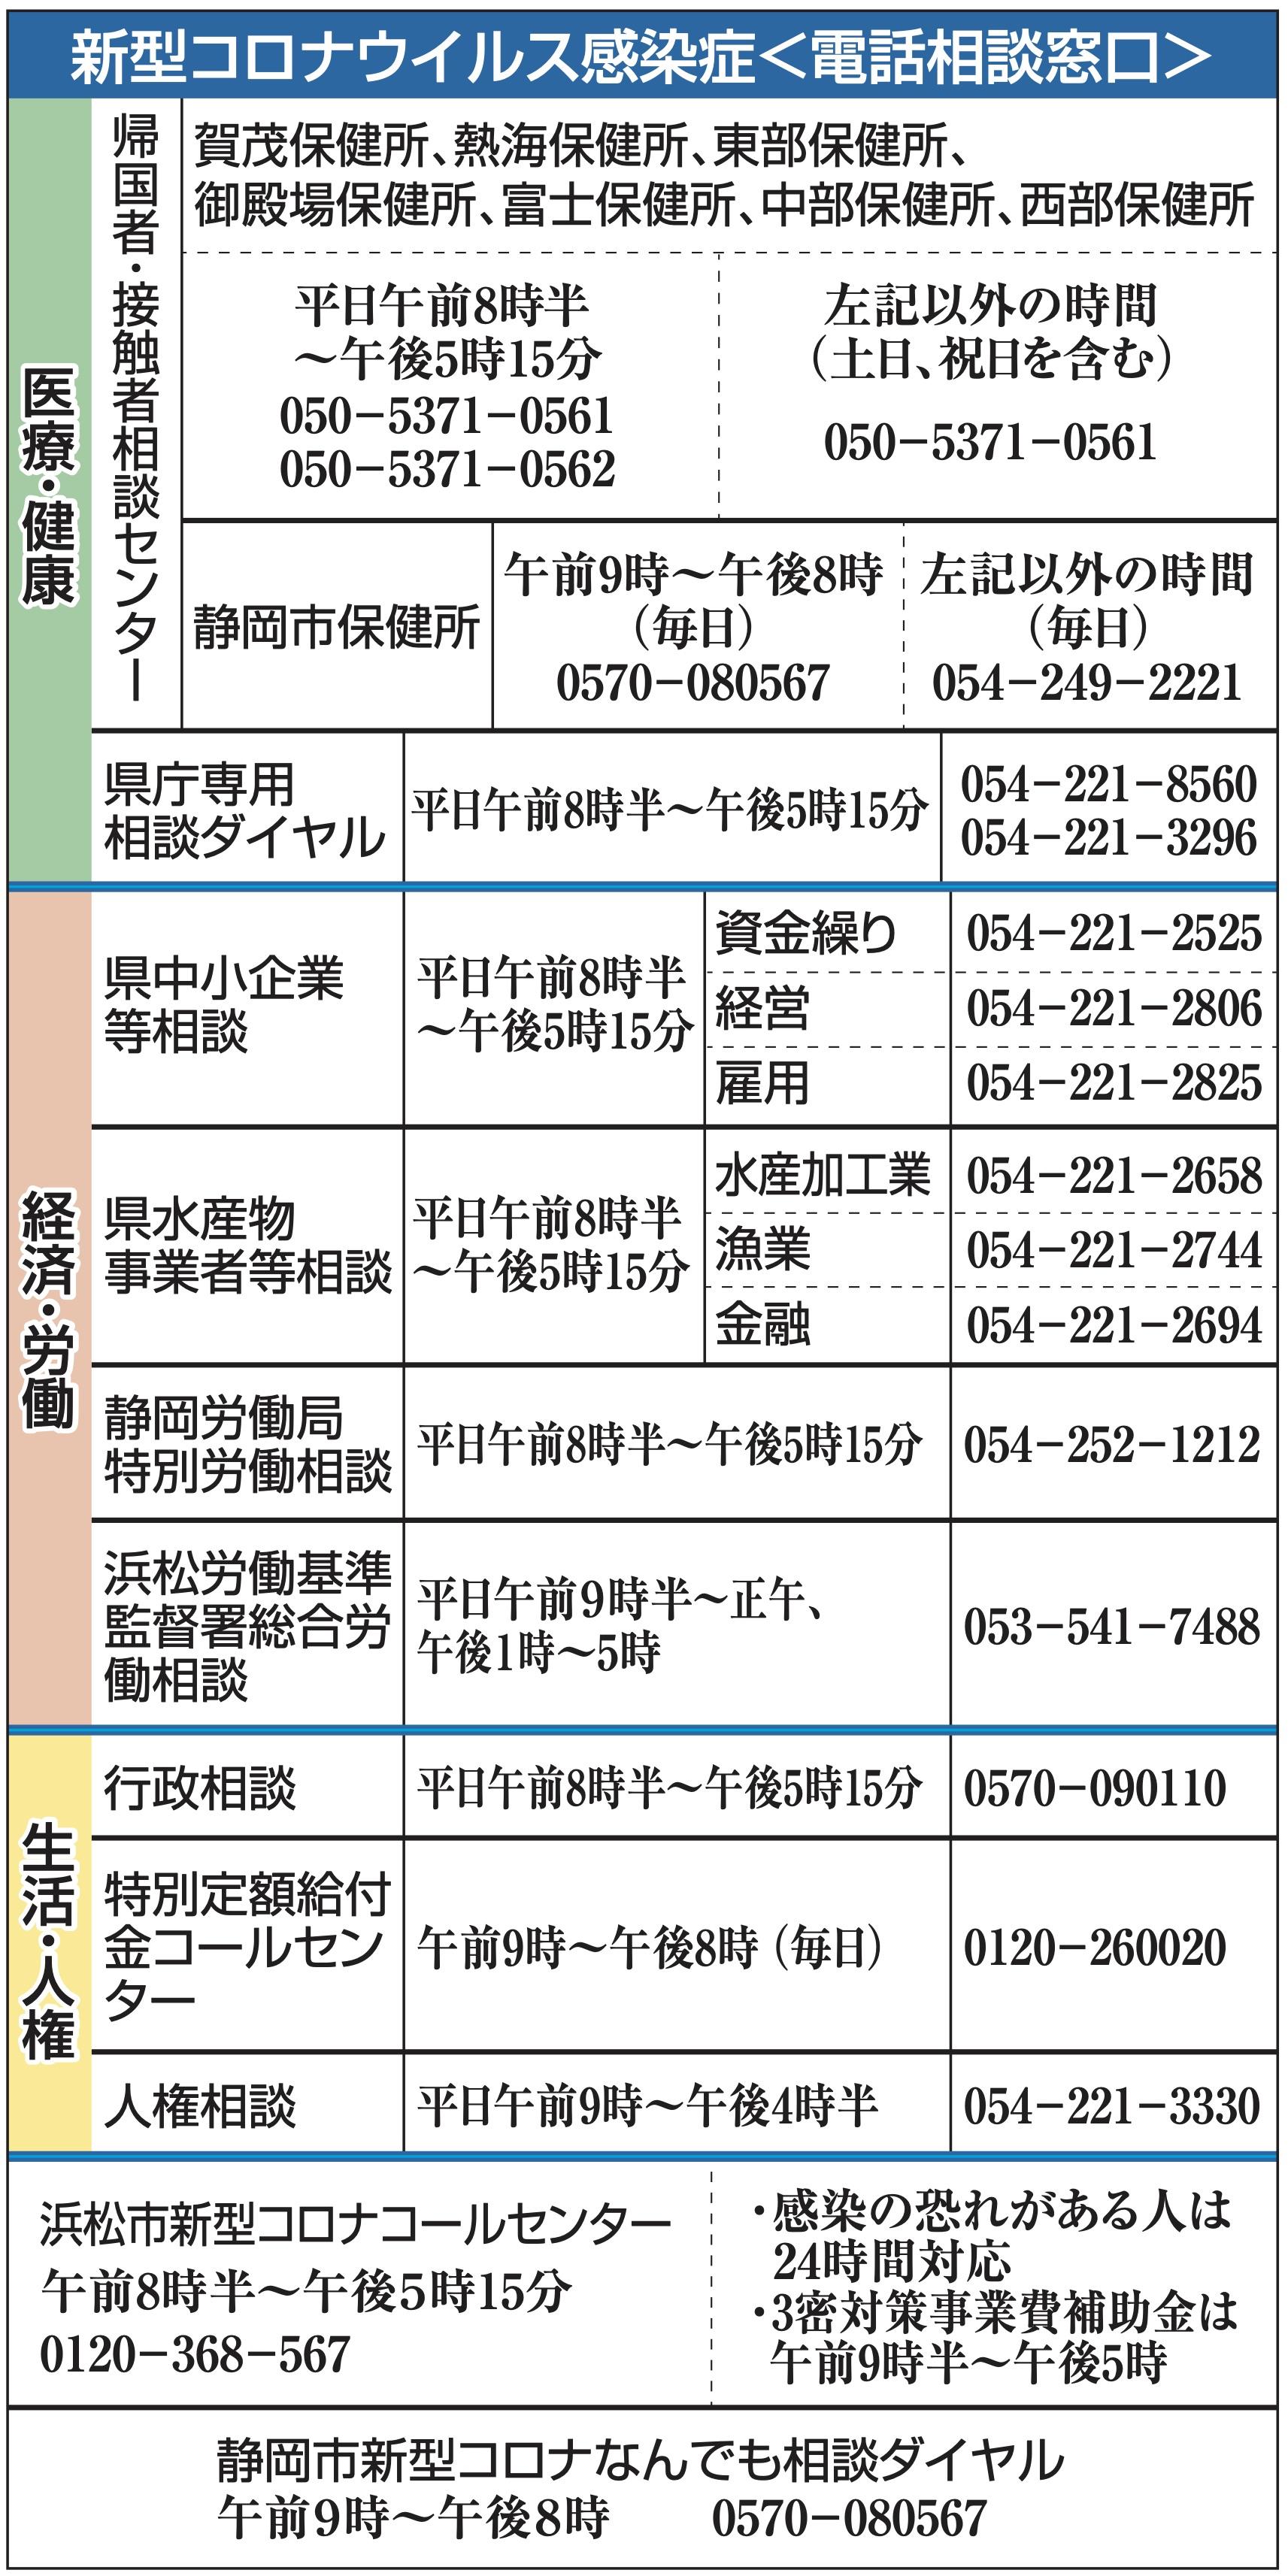 浜松 静岡 コロナ 感染 市 者 県